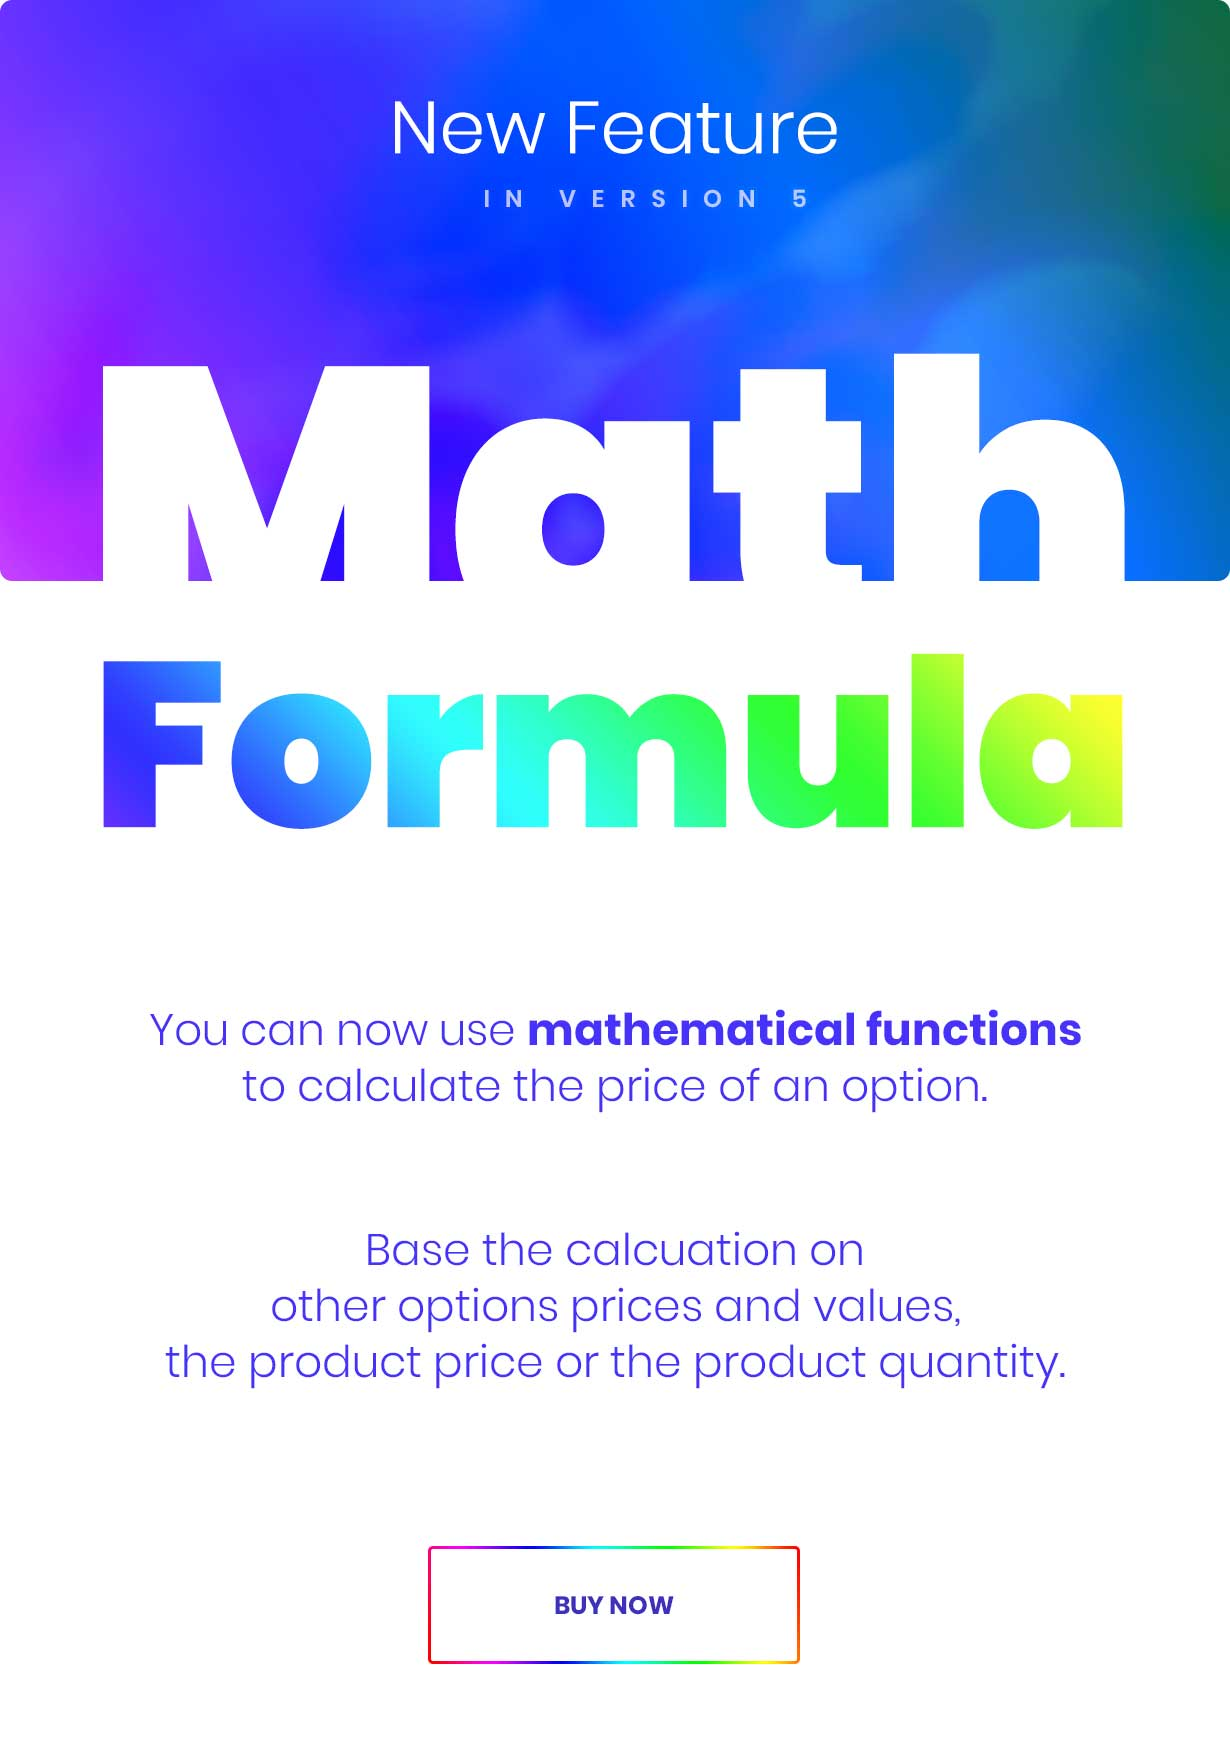 Özelliği Matematik